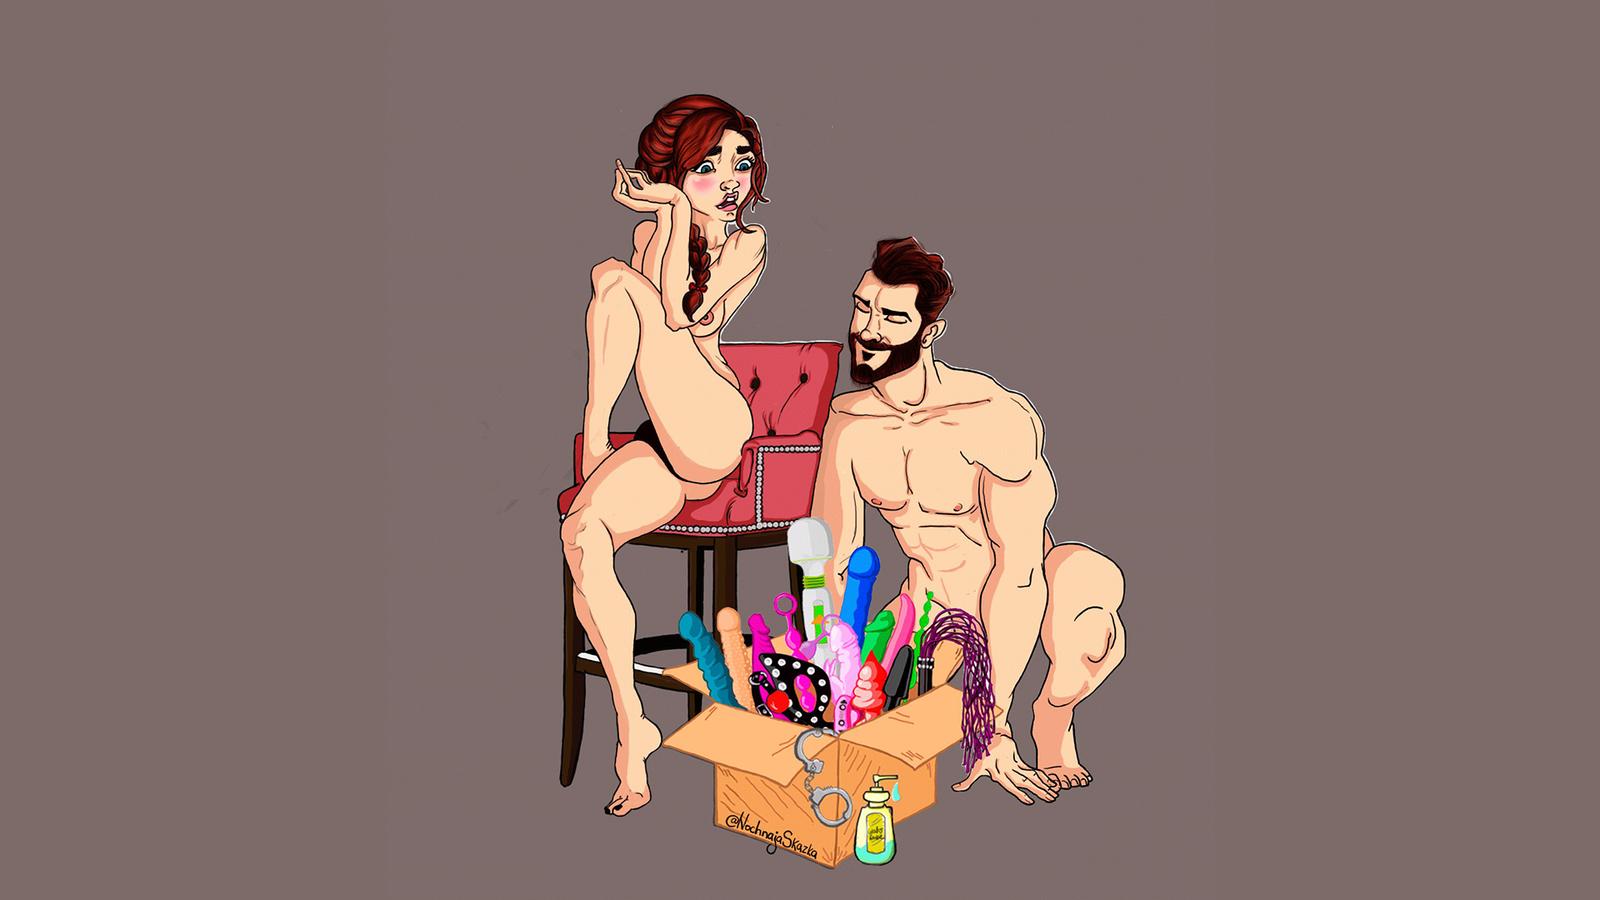 Все рисунки эротики и секса